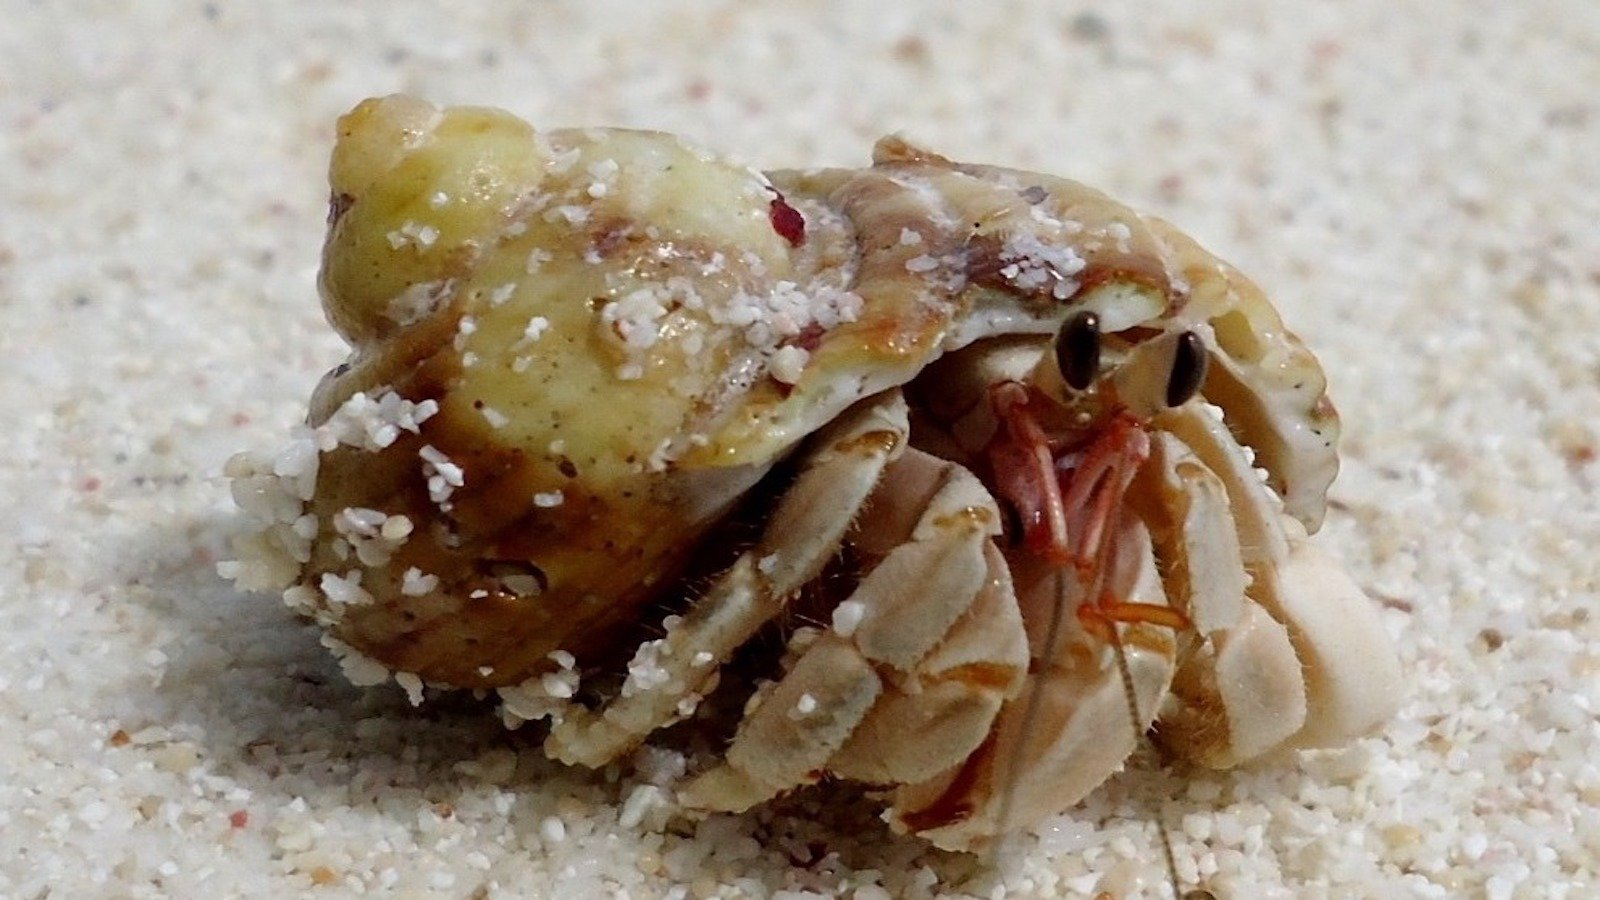 Hermit crabs on the beach